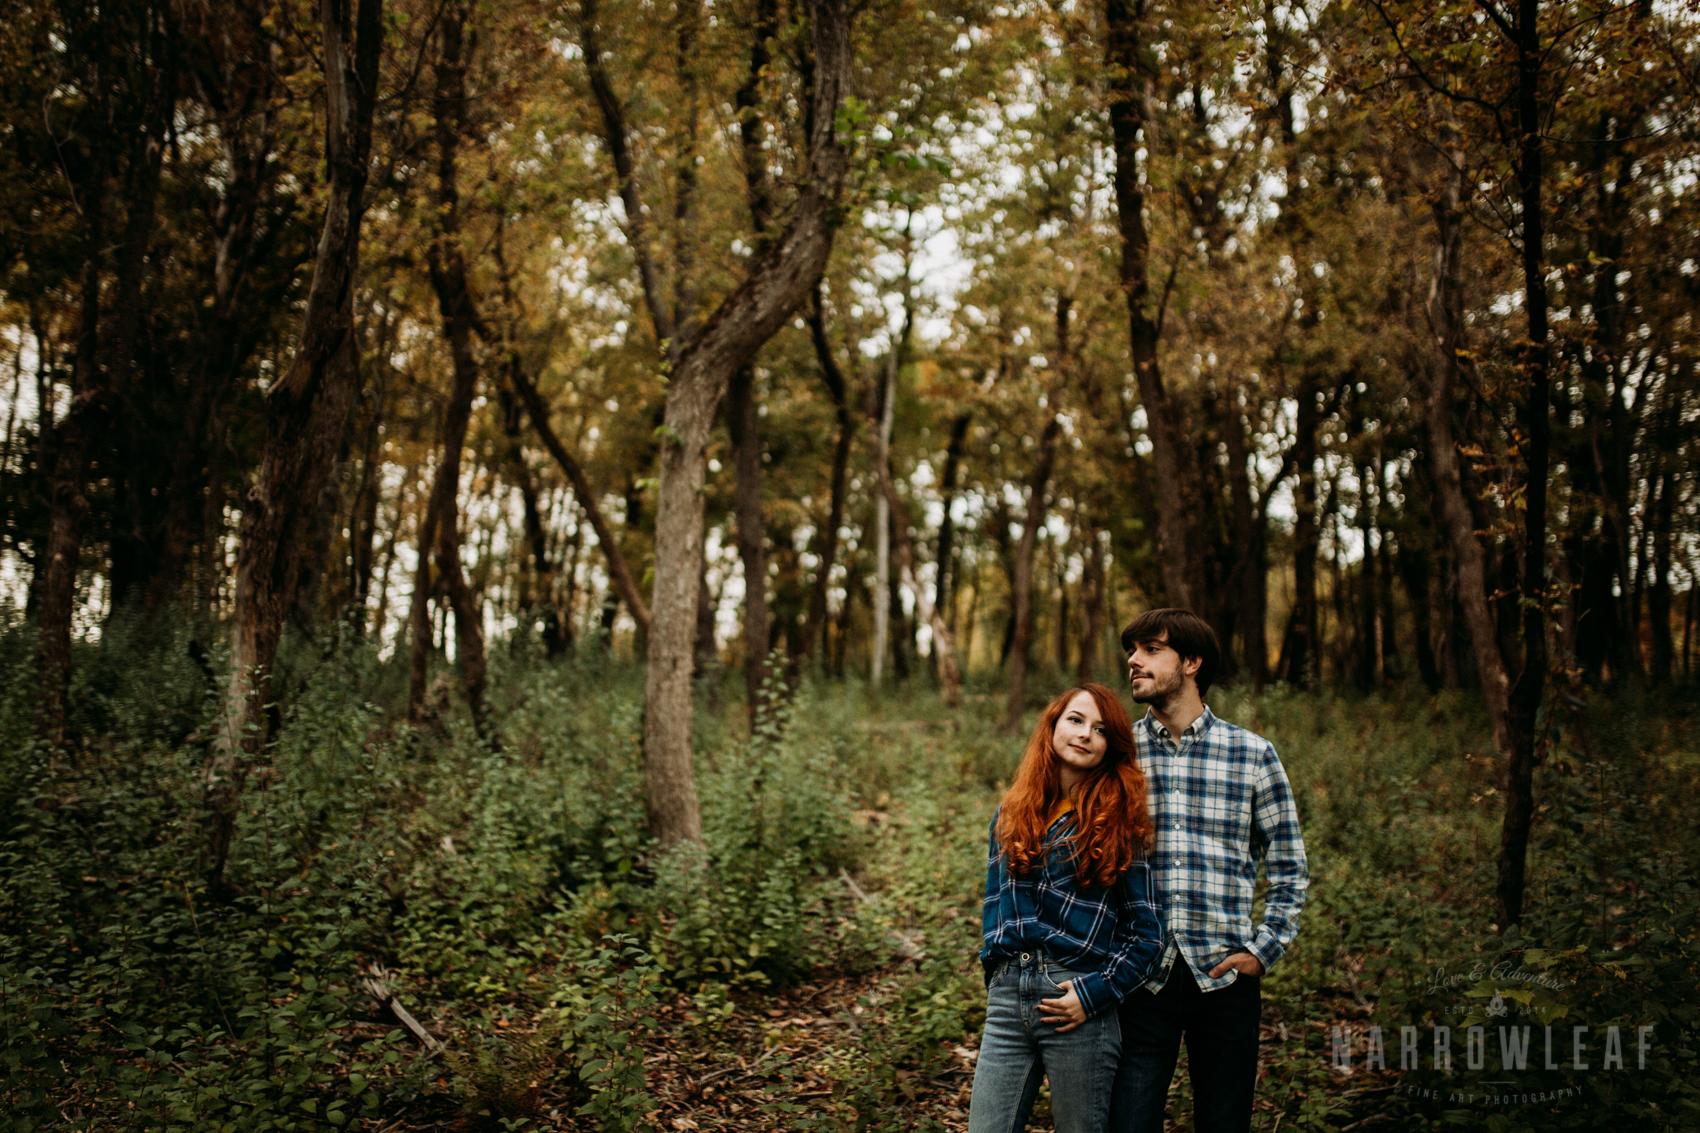 fall-engagement-lebanon-hills-mn-NarrowLeaf_Adventure_Photography-27.jpg